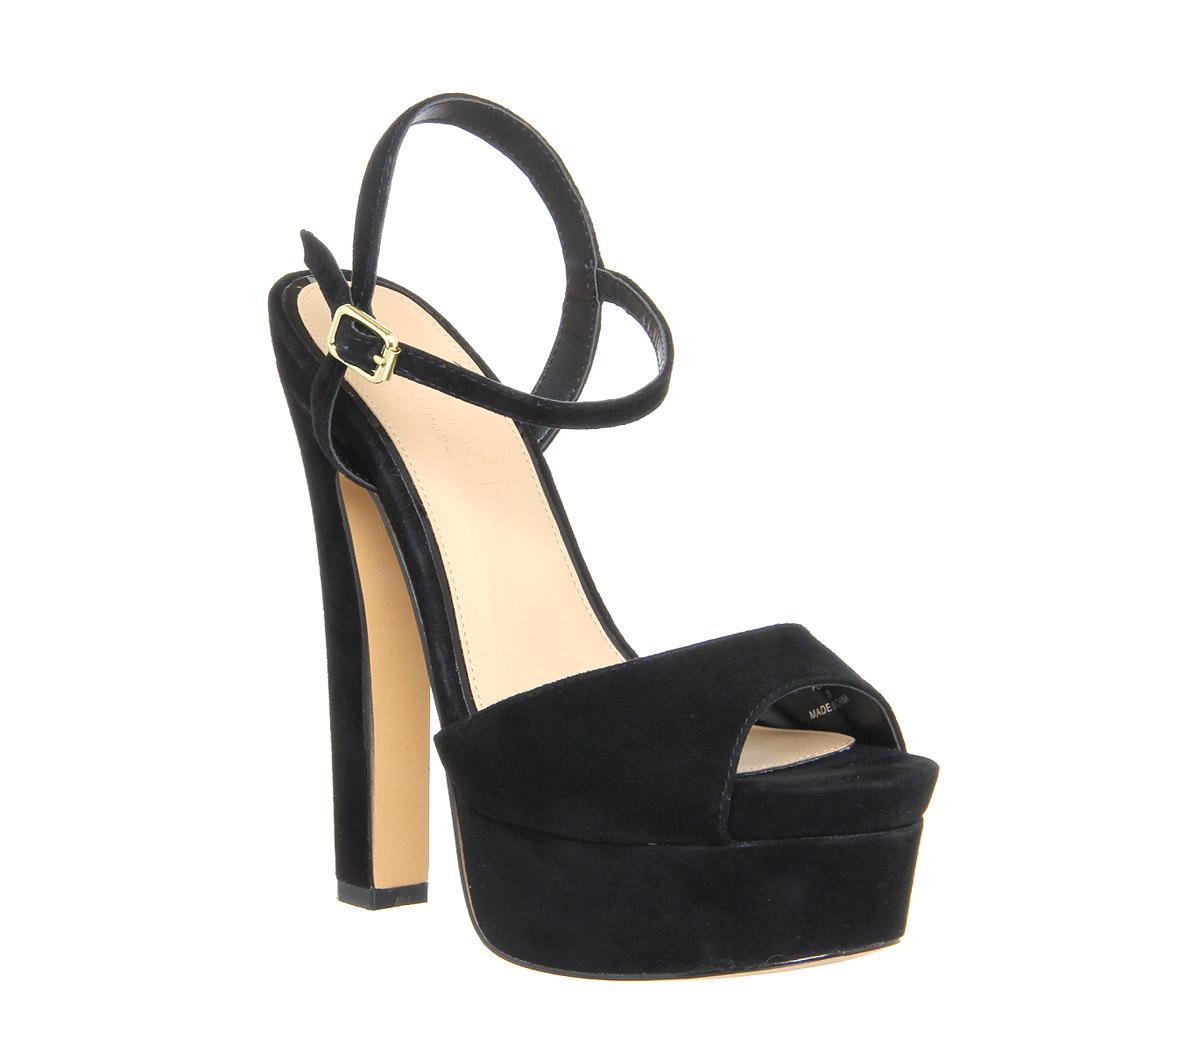 Pace High Heel Sandals